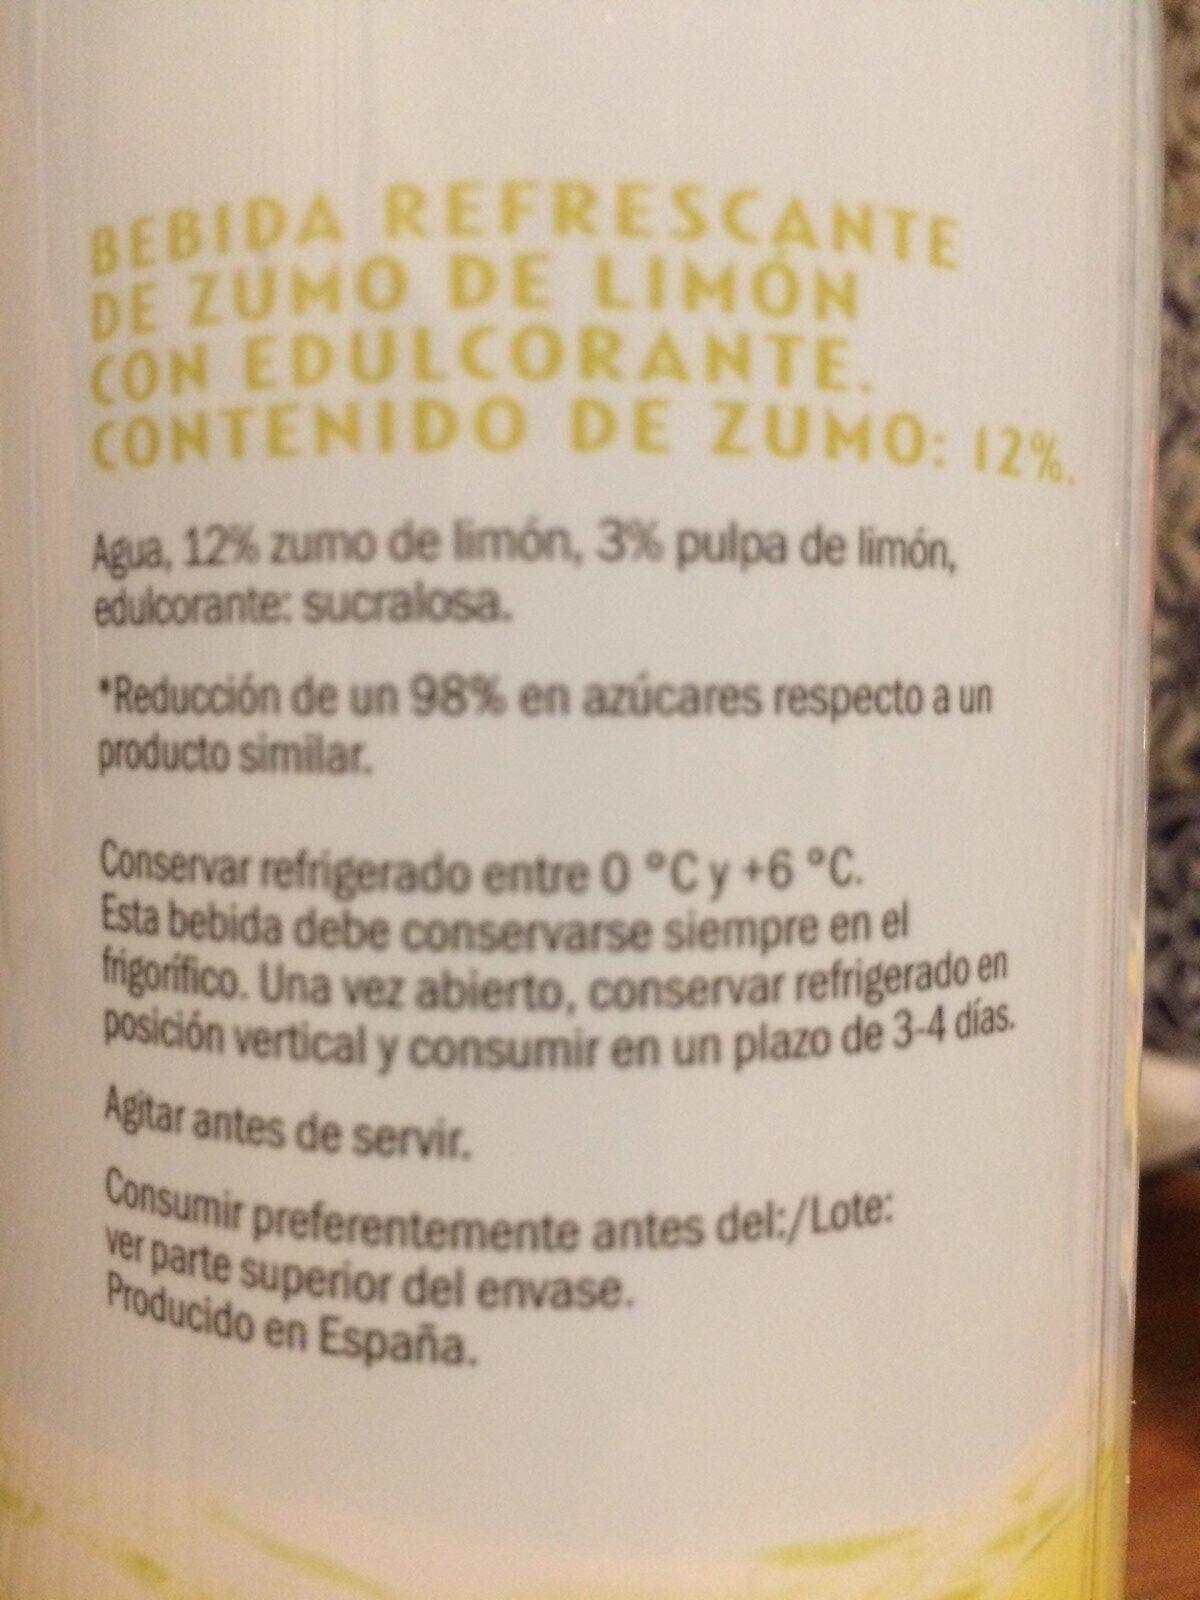 Limonada light - Ingrédients - fr